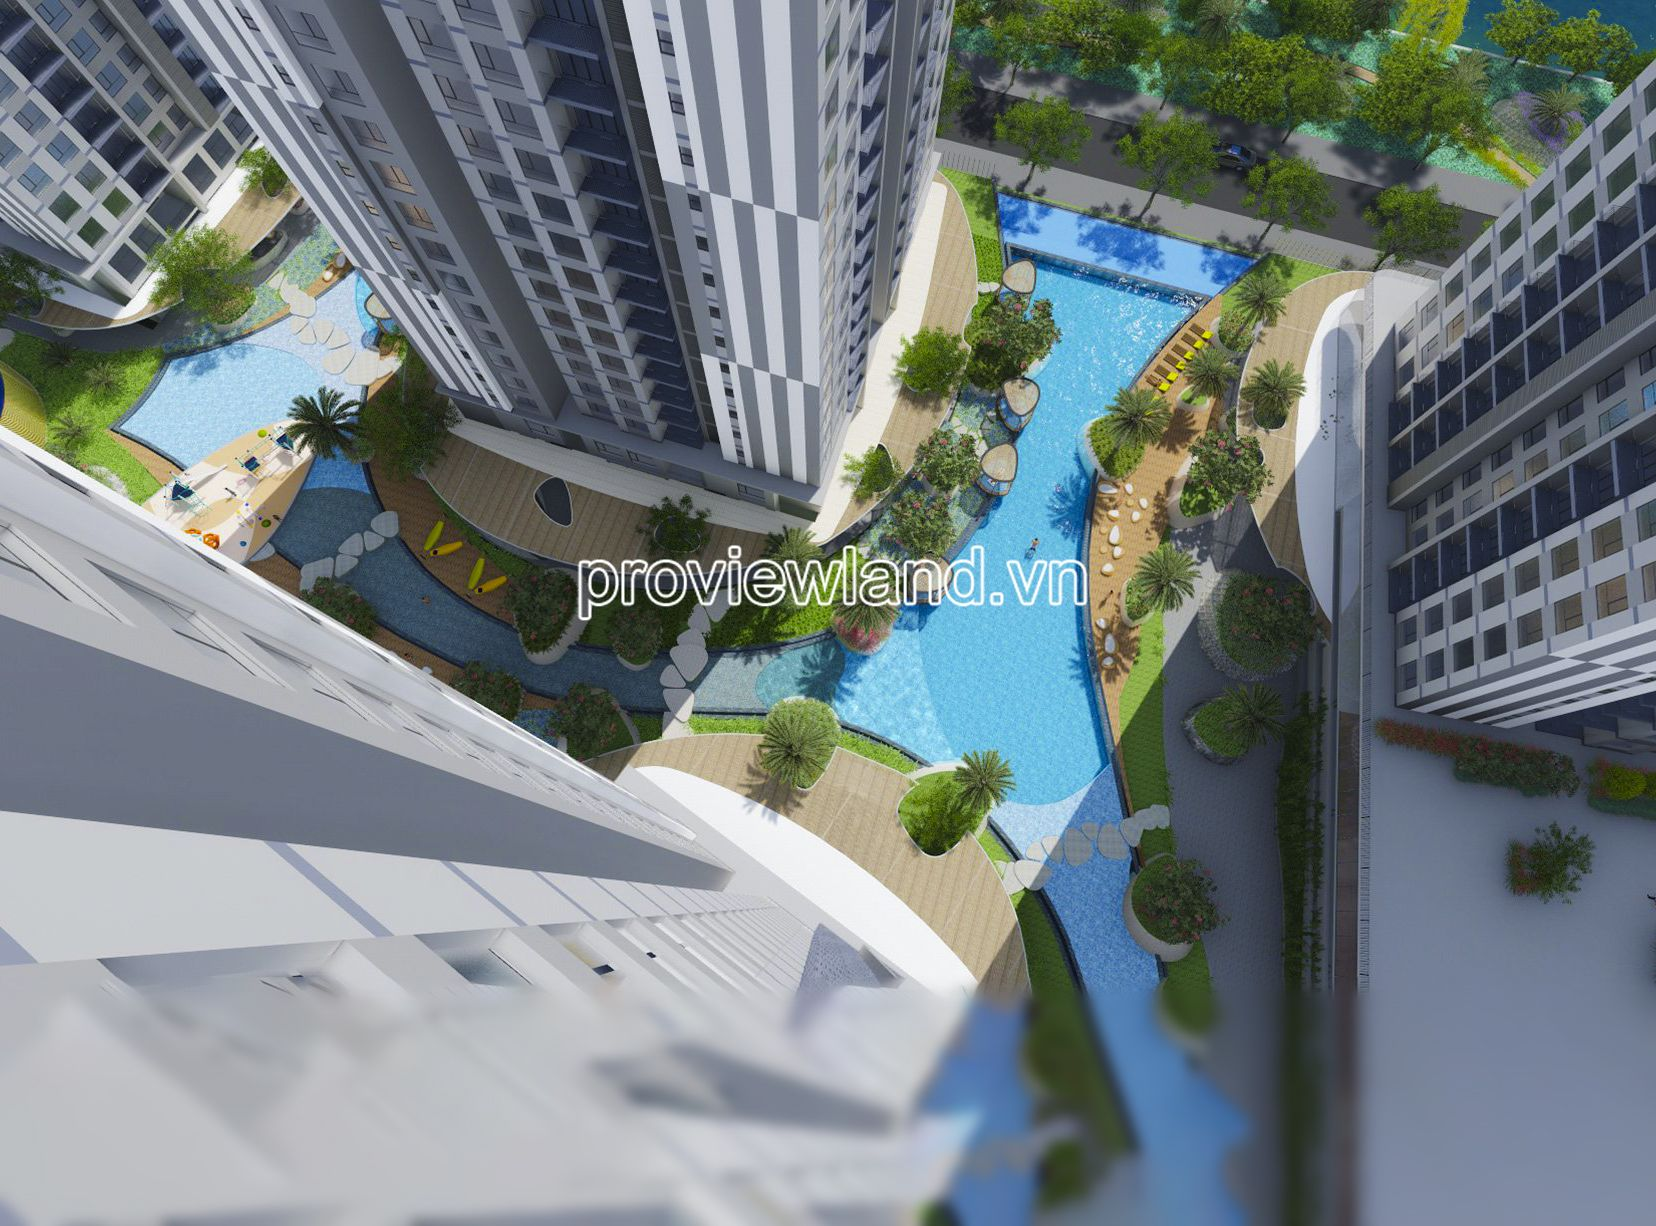 Gem-Riverside-Q2-facilities-tien-ich-proviewland-07